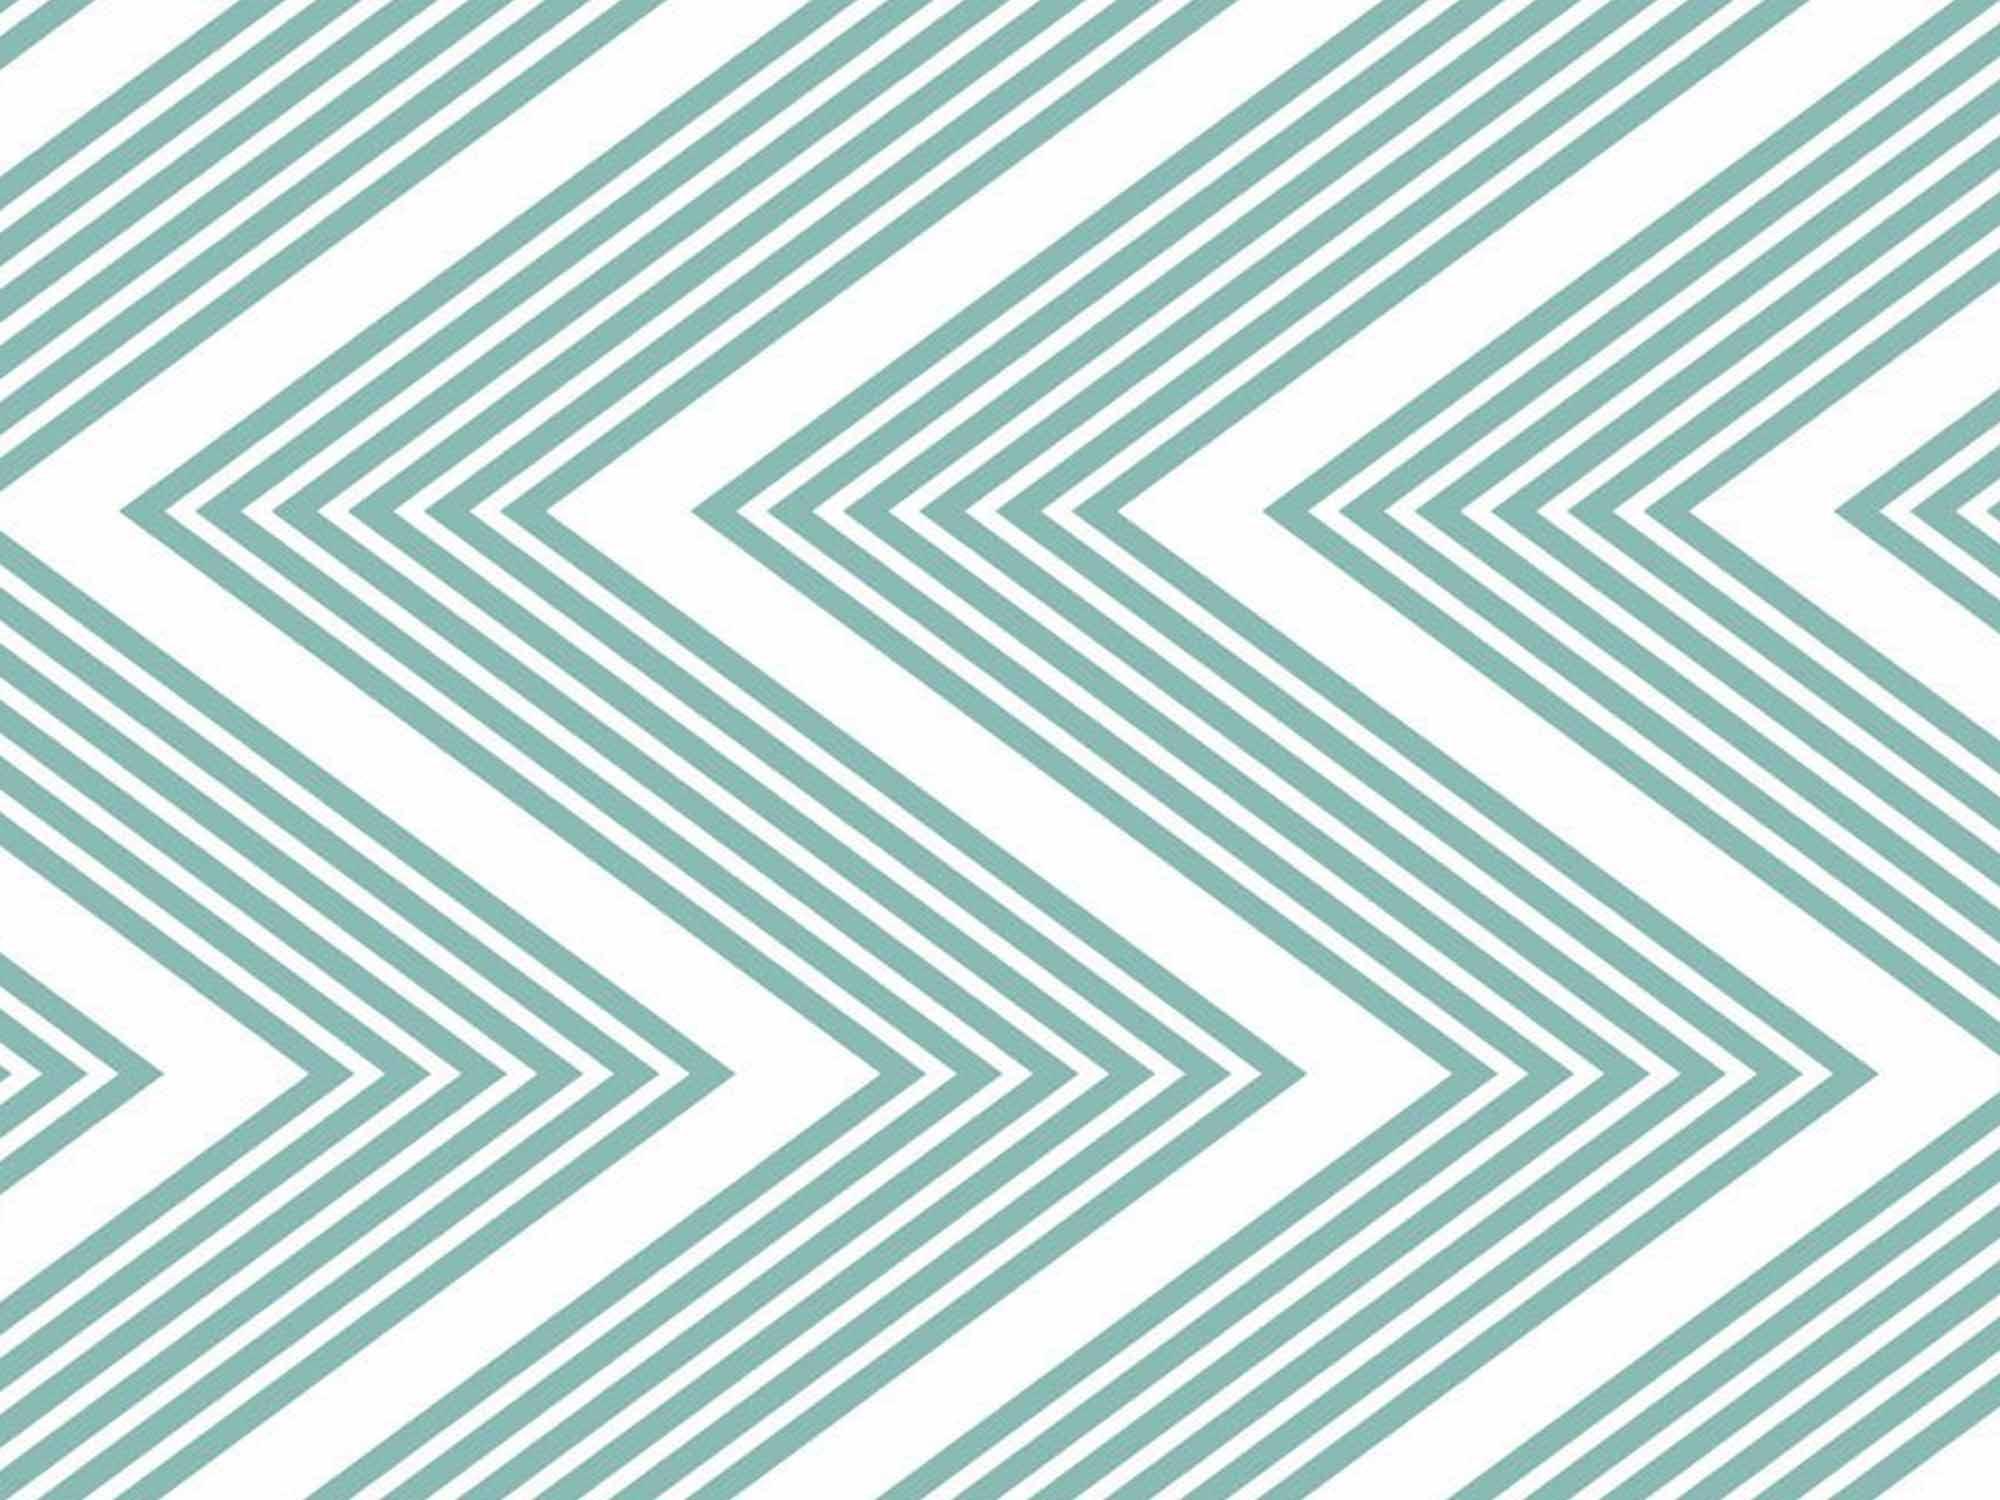 Papel de Parede para Sala Geométrico 0051 - Adesivos de Parede  - Paredes Decoradas